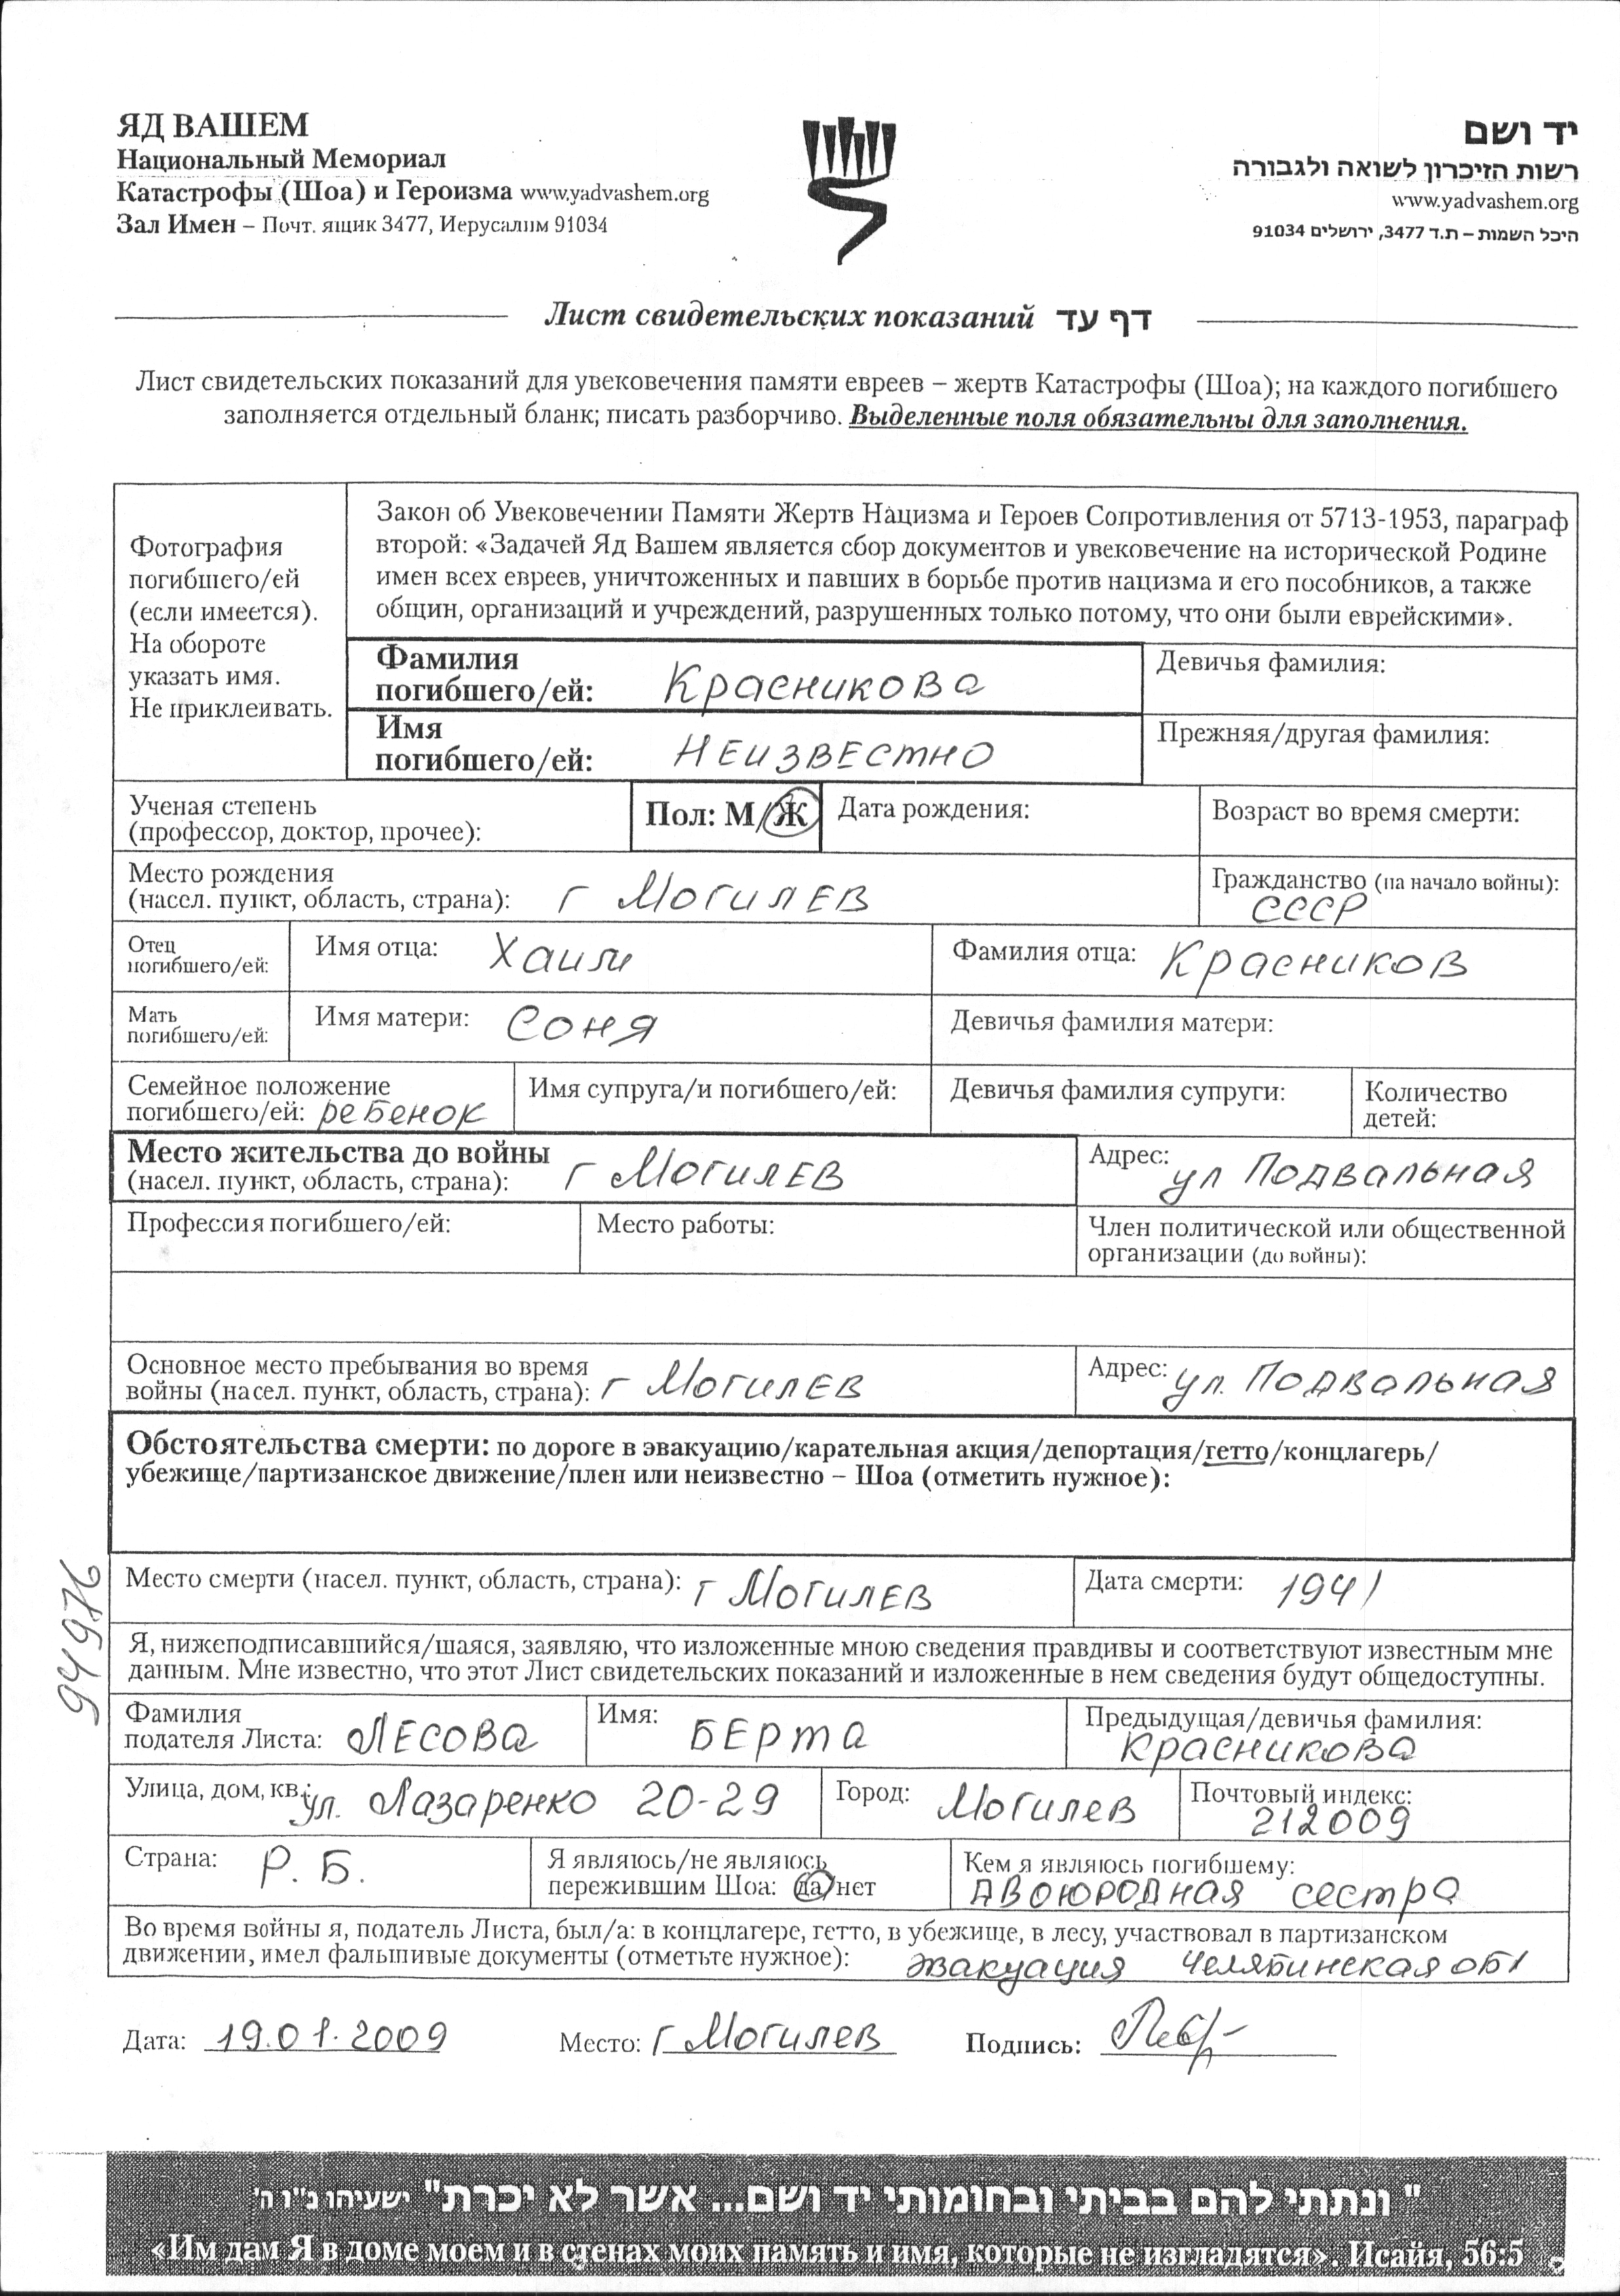 Сын Хаима Красникова еще один (анкета)